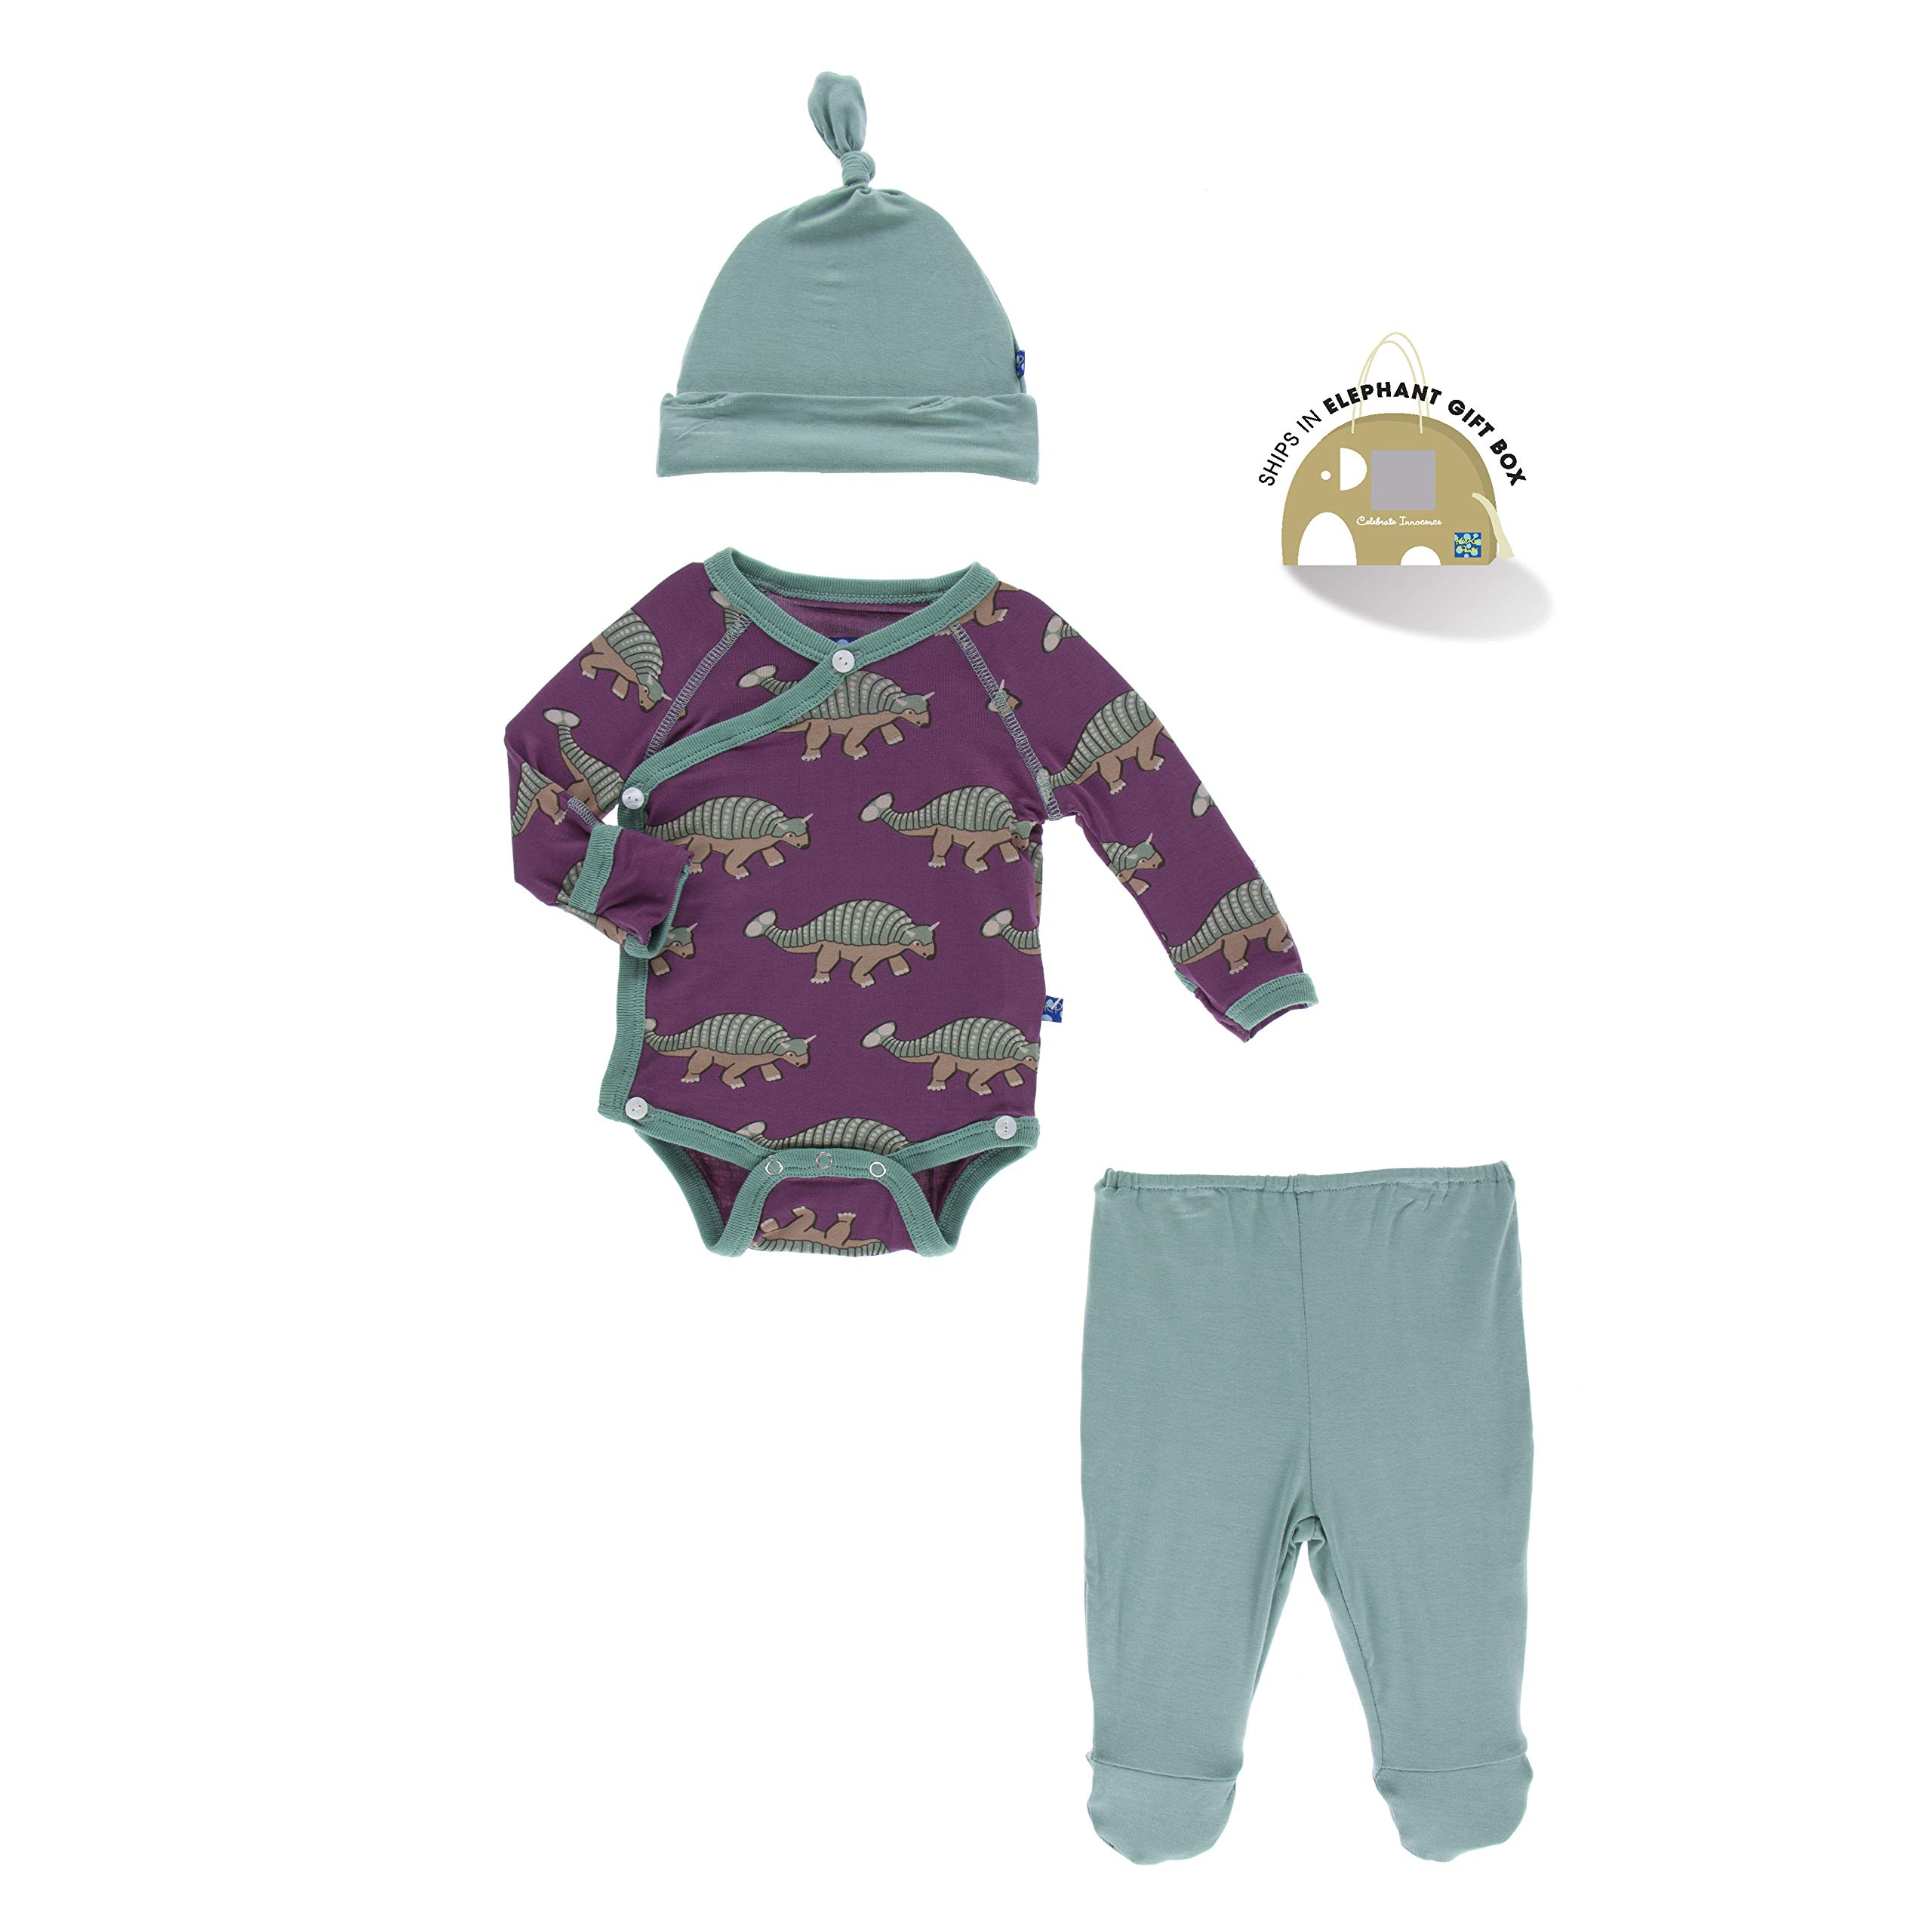 Kickee Pants Kimono Gift Set with Elephant Box Euoplocephalus (NB) by Kickee Pants